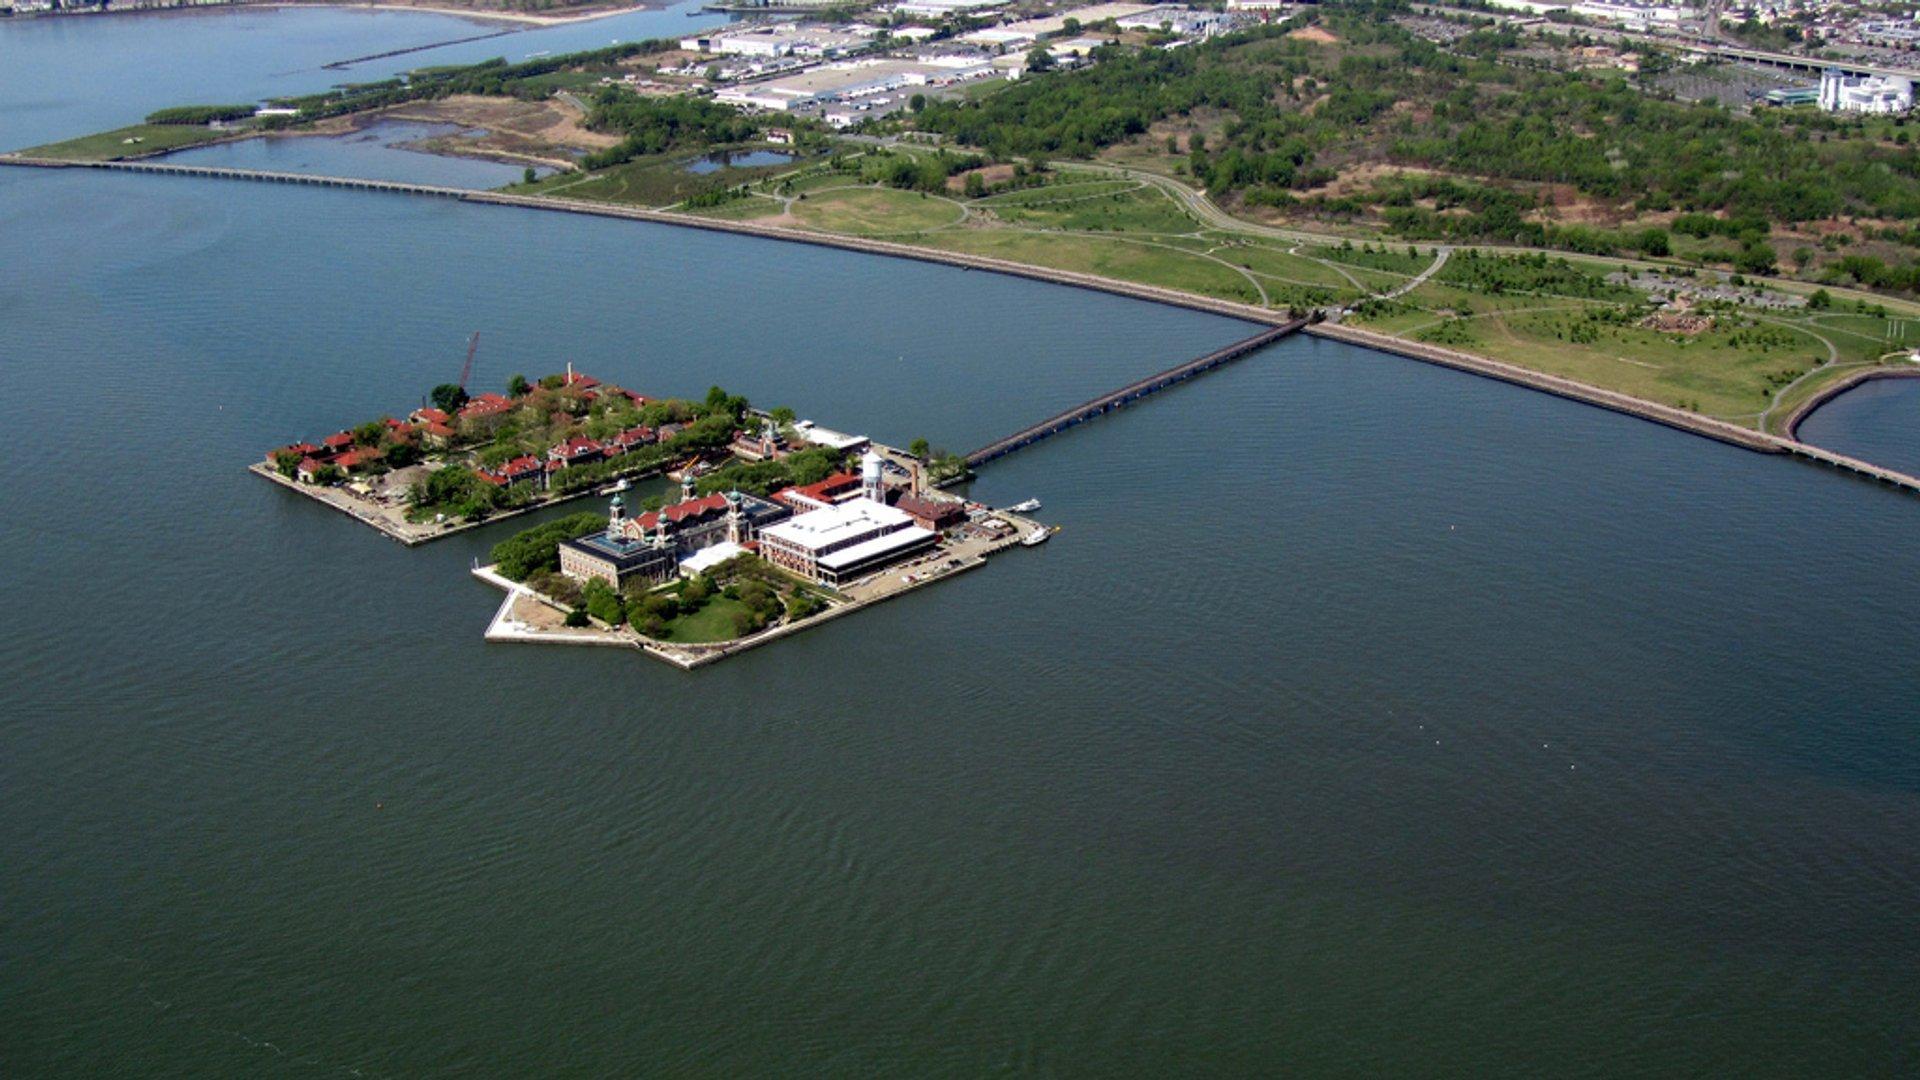 Ellis Island in New York 2020 - Best Time